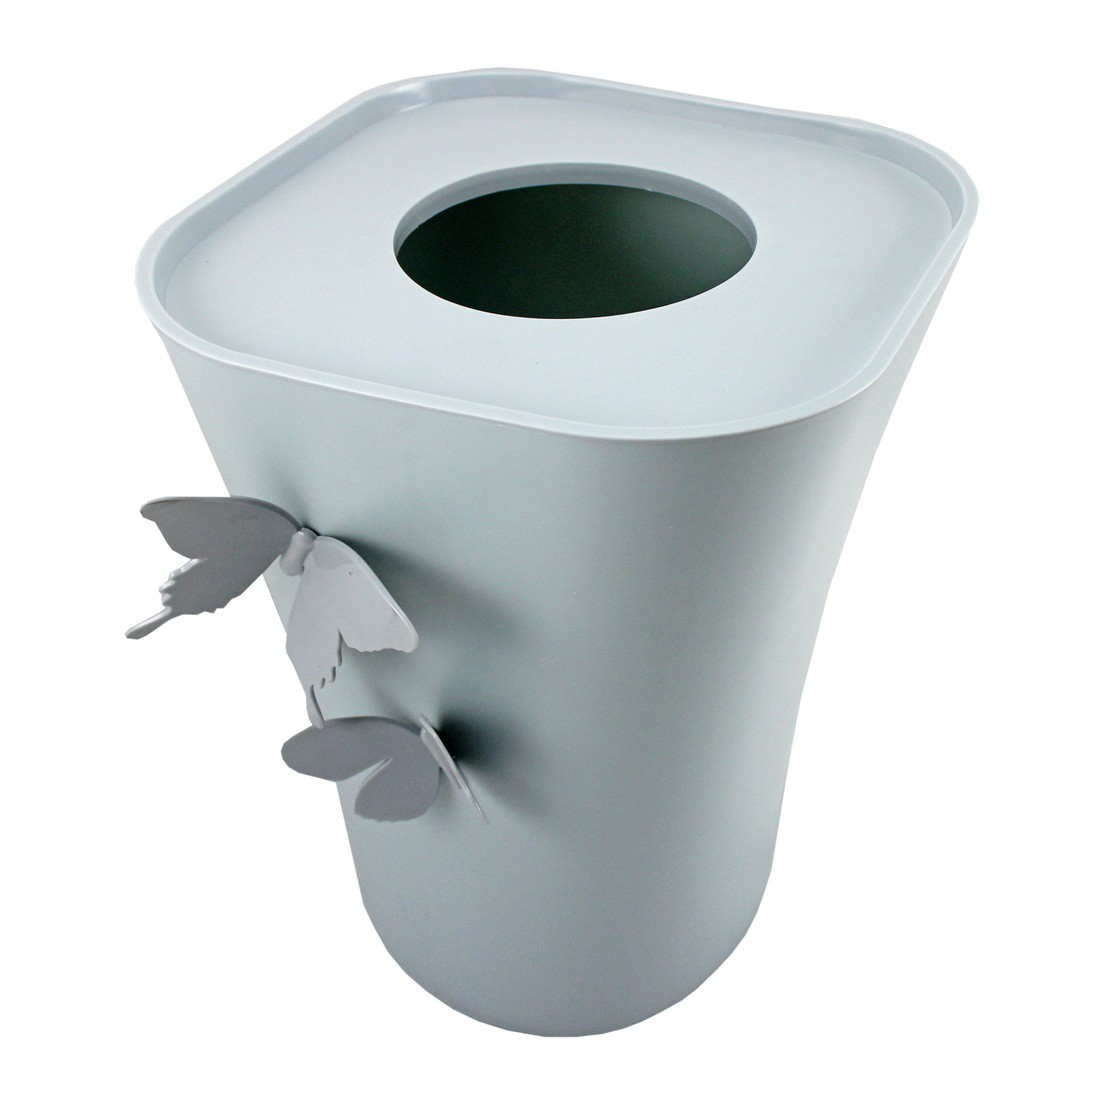 Cesto de Lixo Tamanho Grande Cozy Jacki Design